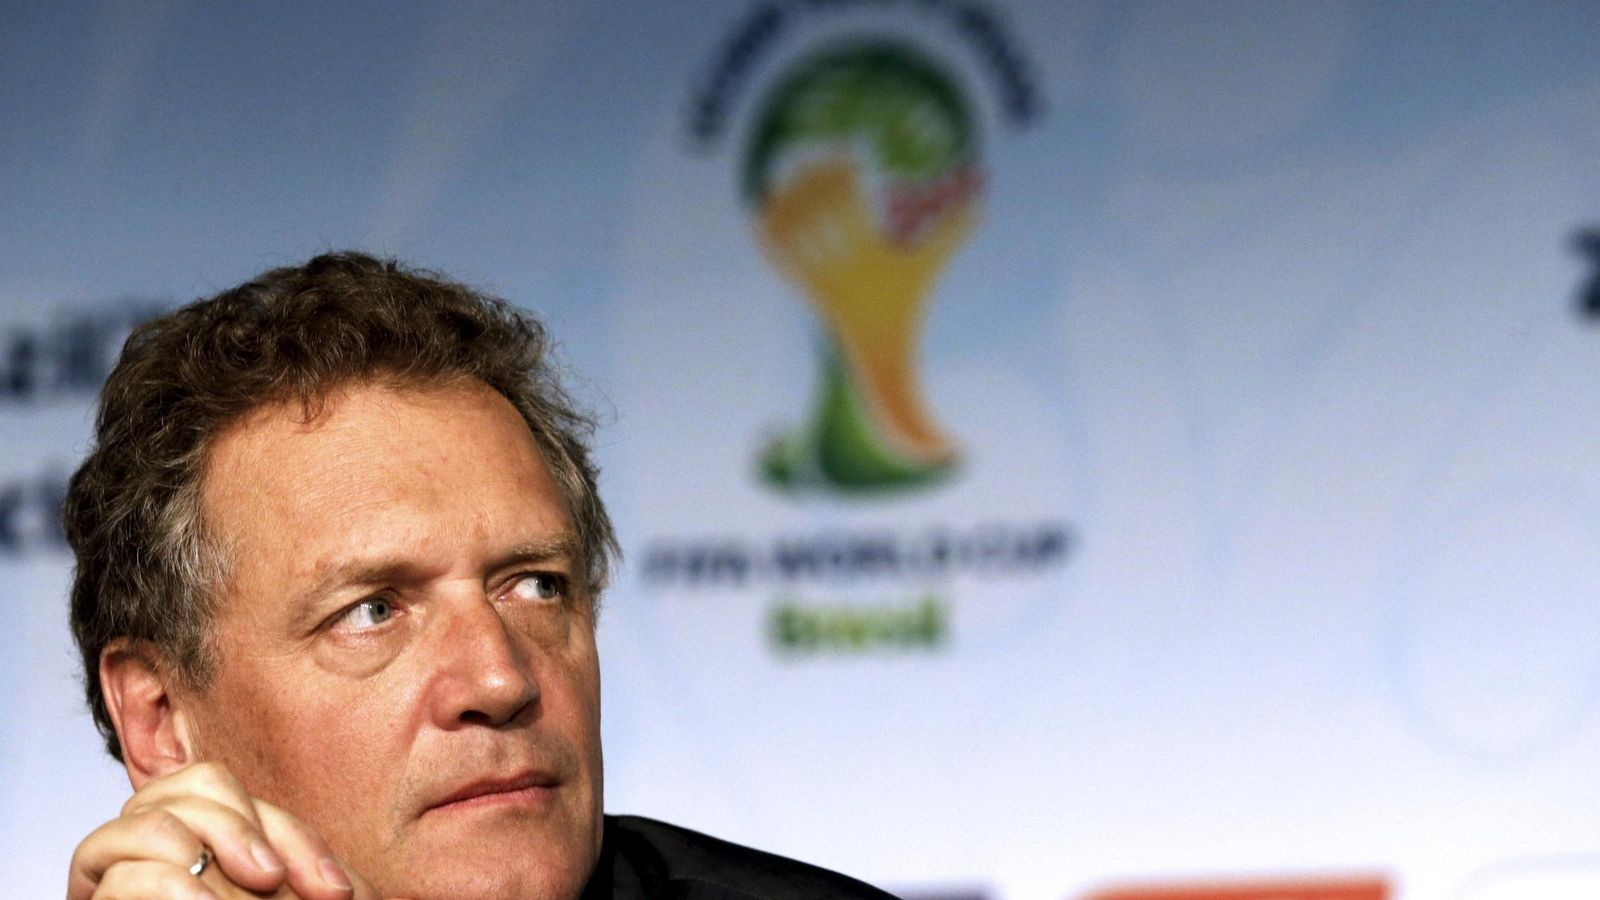 Foto: Valcke, exsecretario general de la FIFA (Reuters)